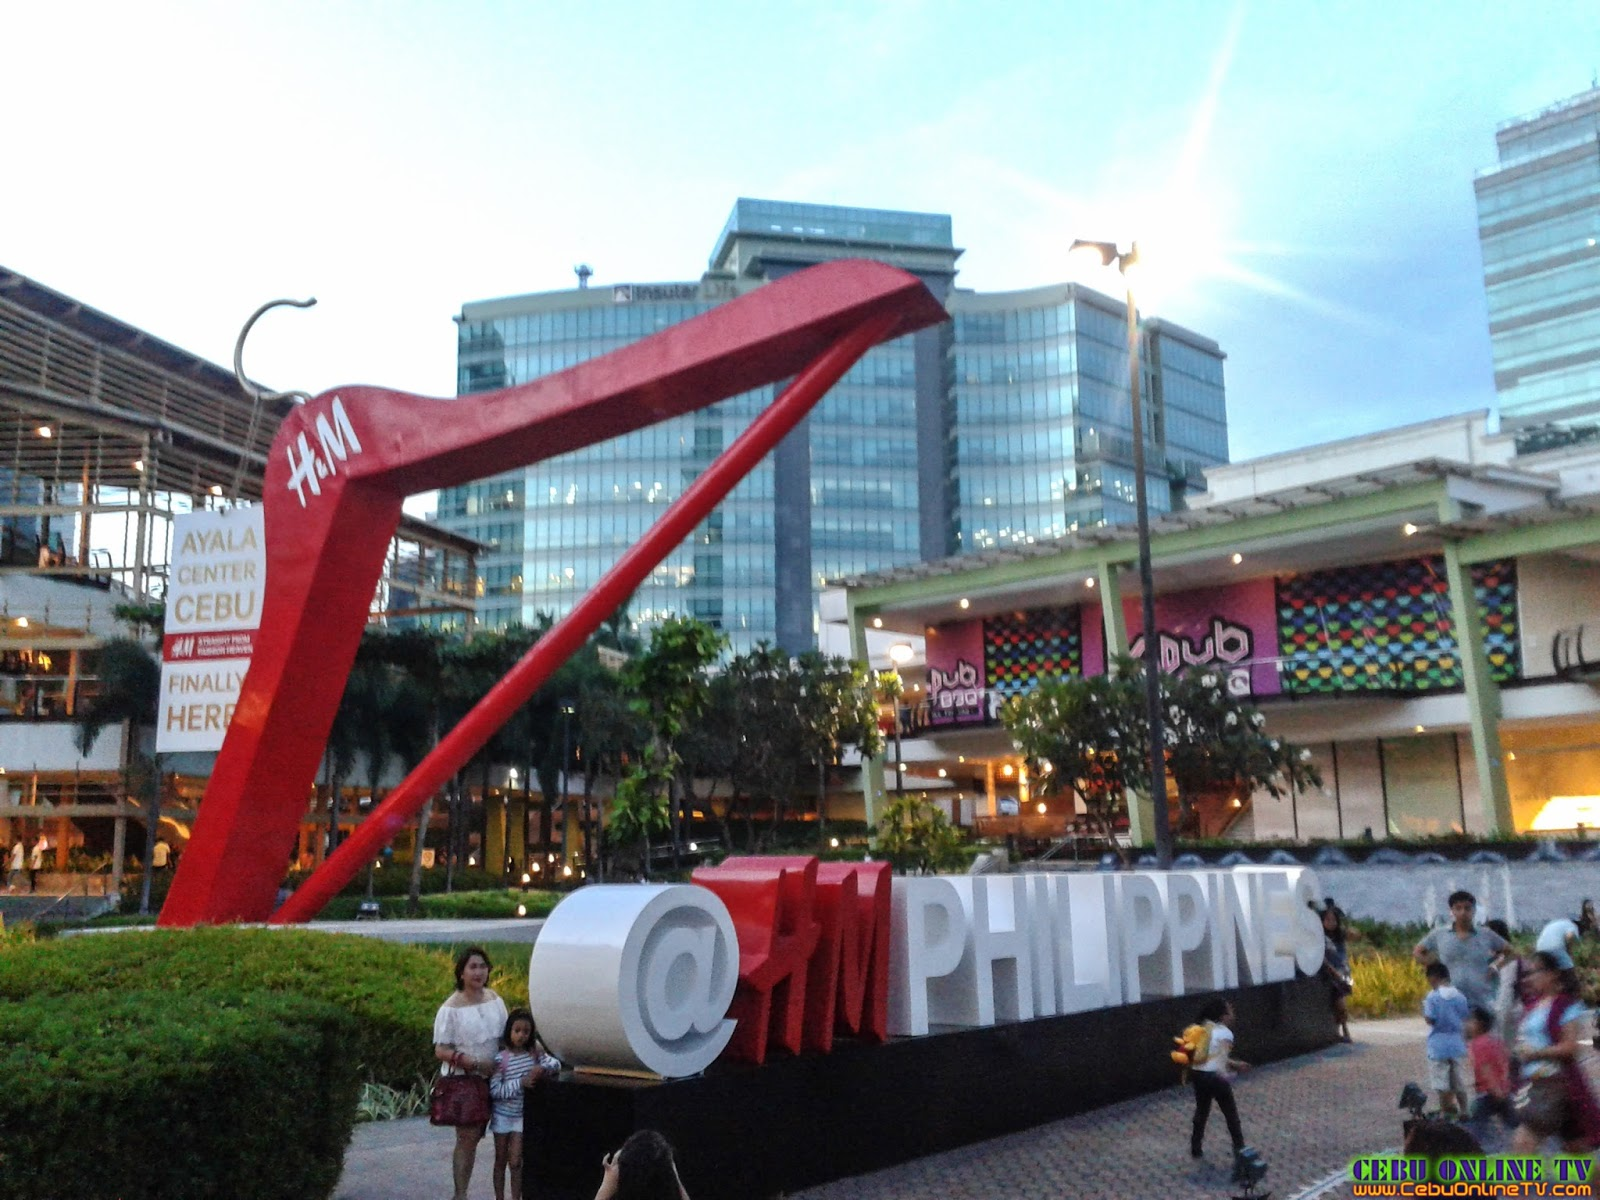 H&M Ayala Center Cebu